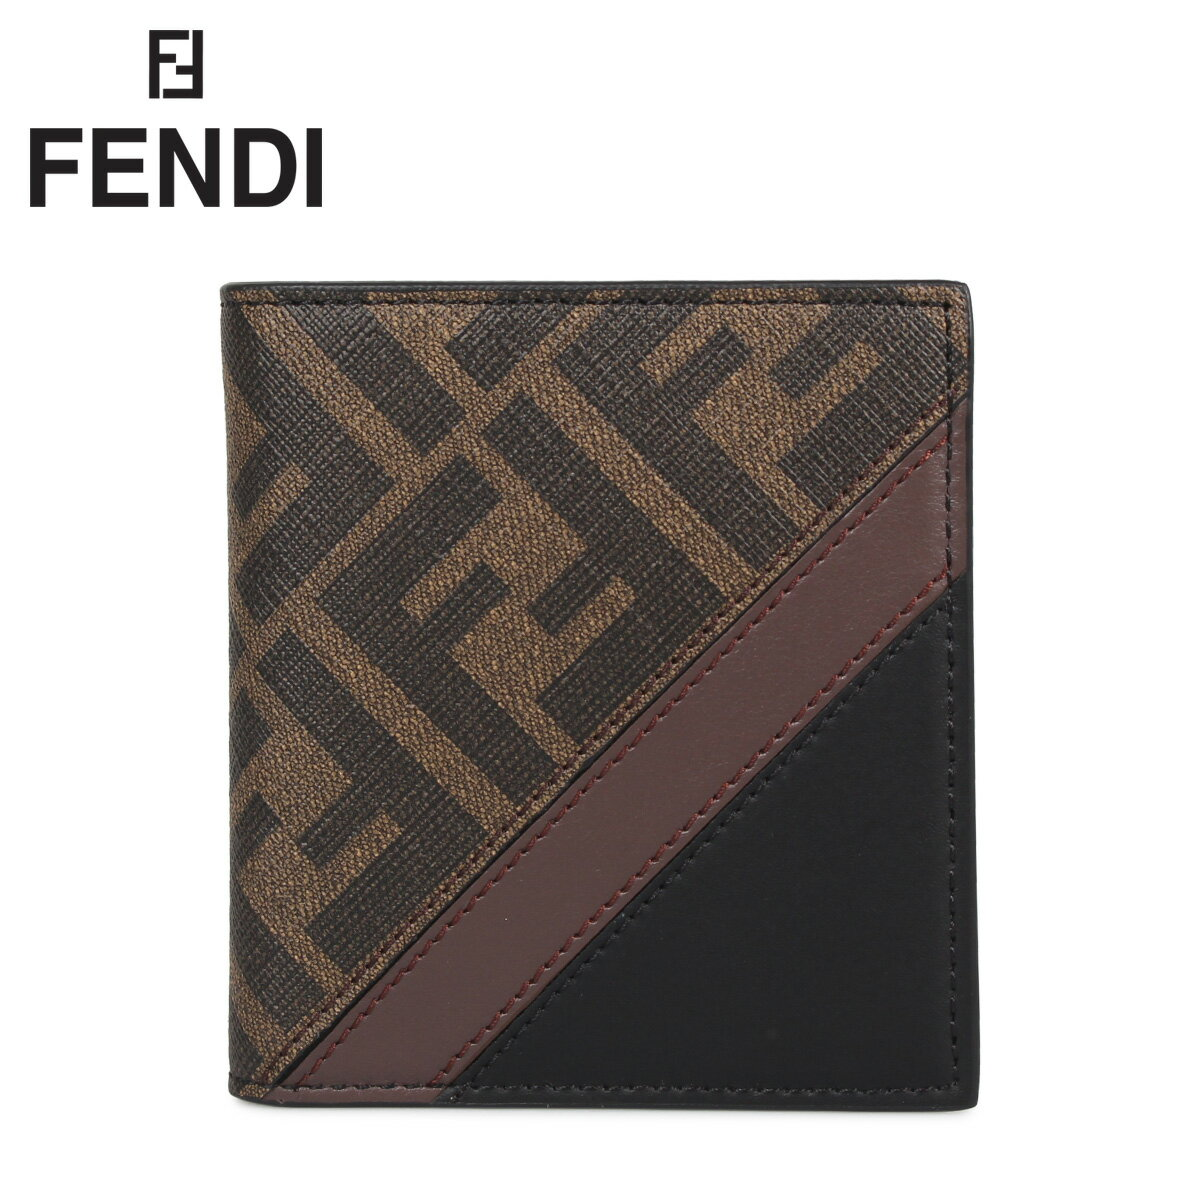 FENDI(フェンディ)『二つ折り財布(7M0274A9XSF199B)』